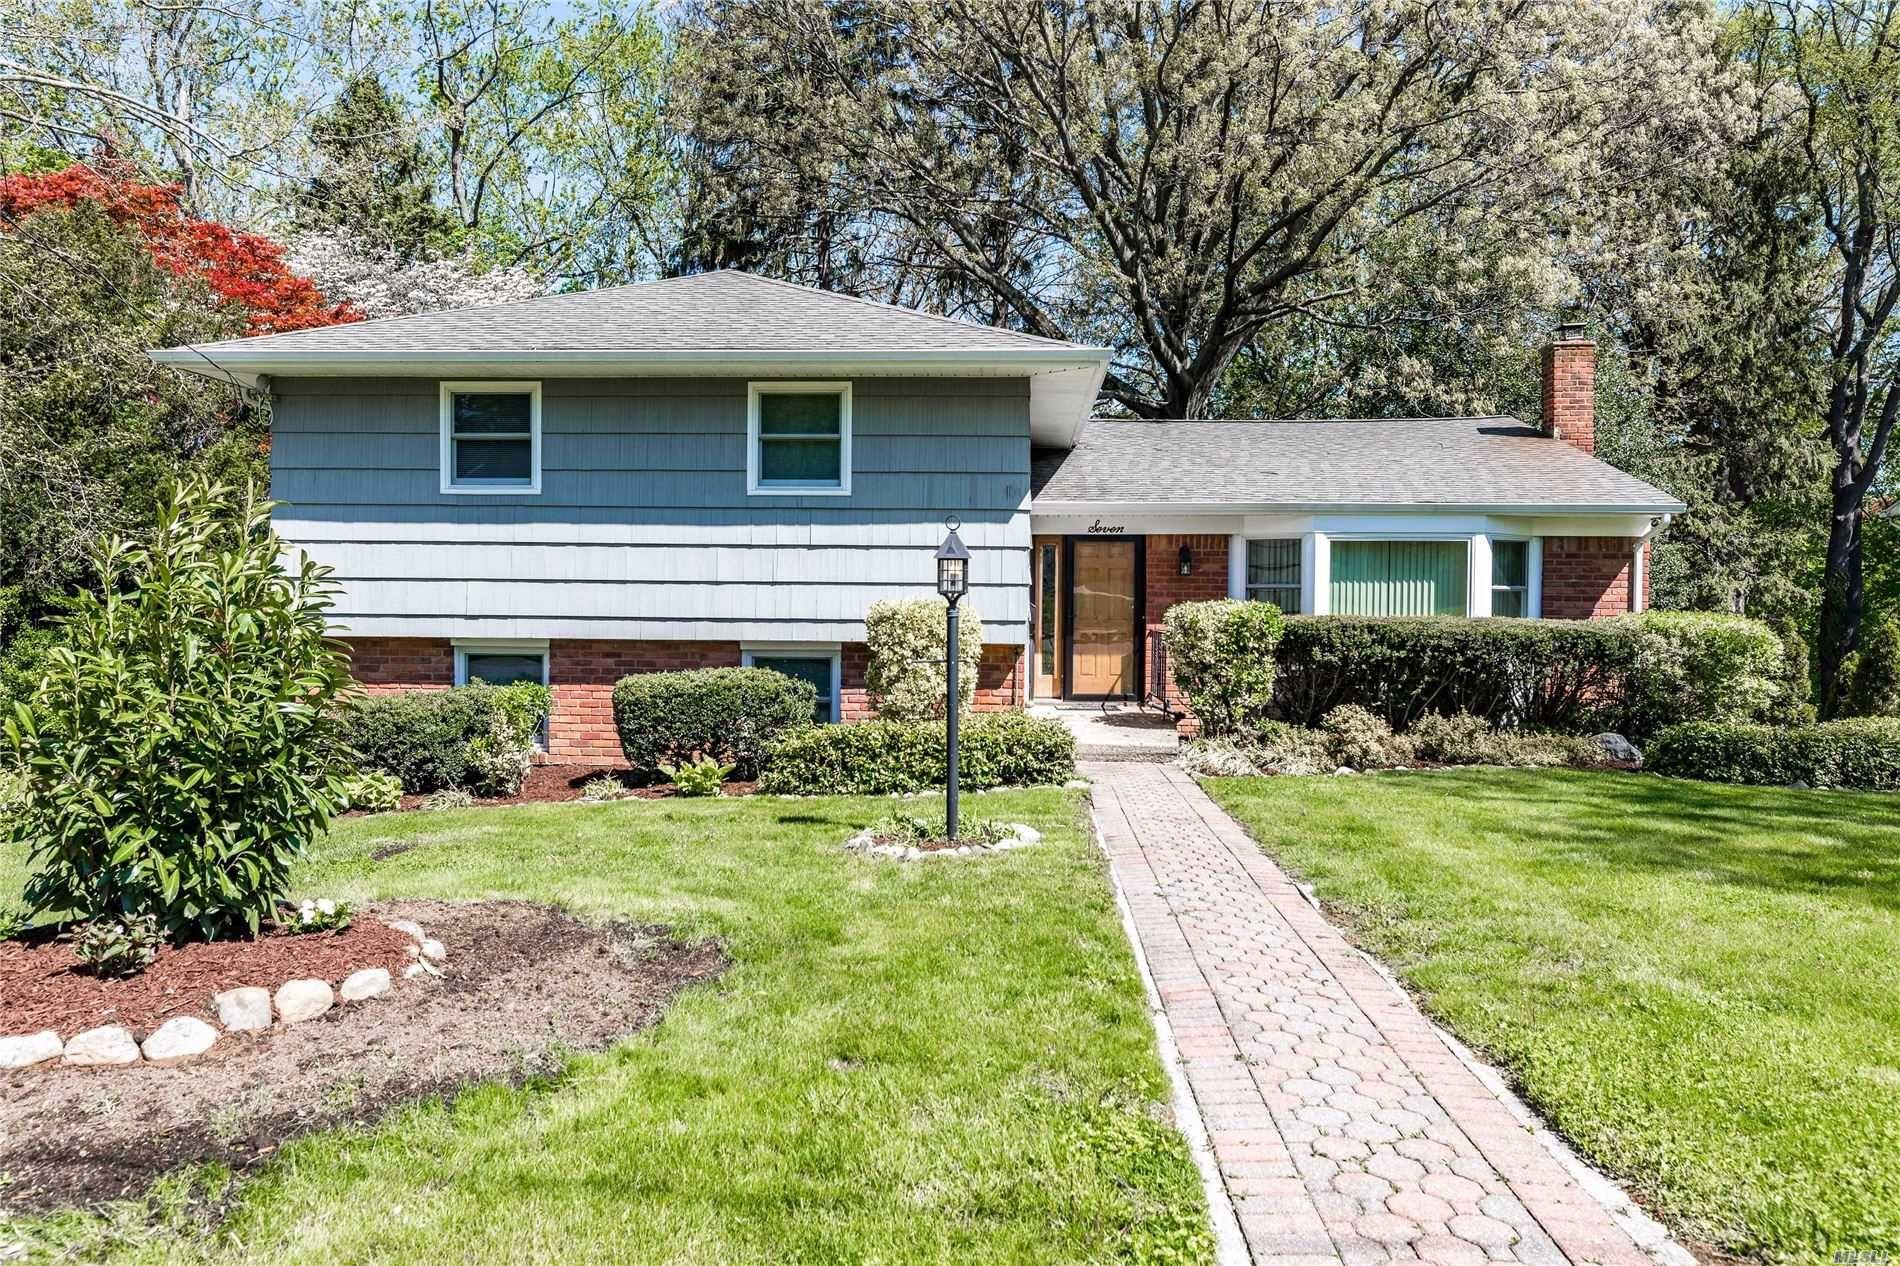 7 Copperdale Lane, Huntington, NY 11743 - MLS#: 3213562